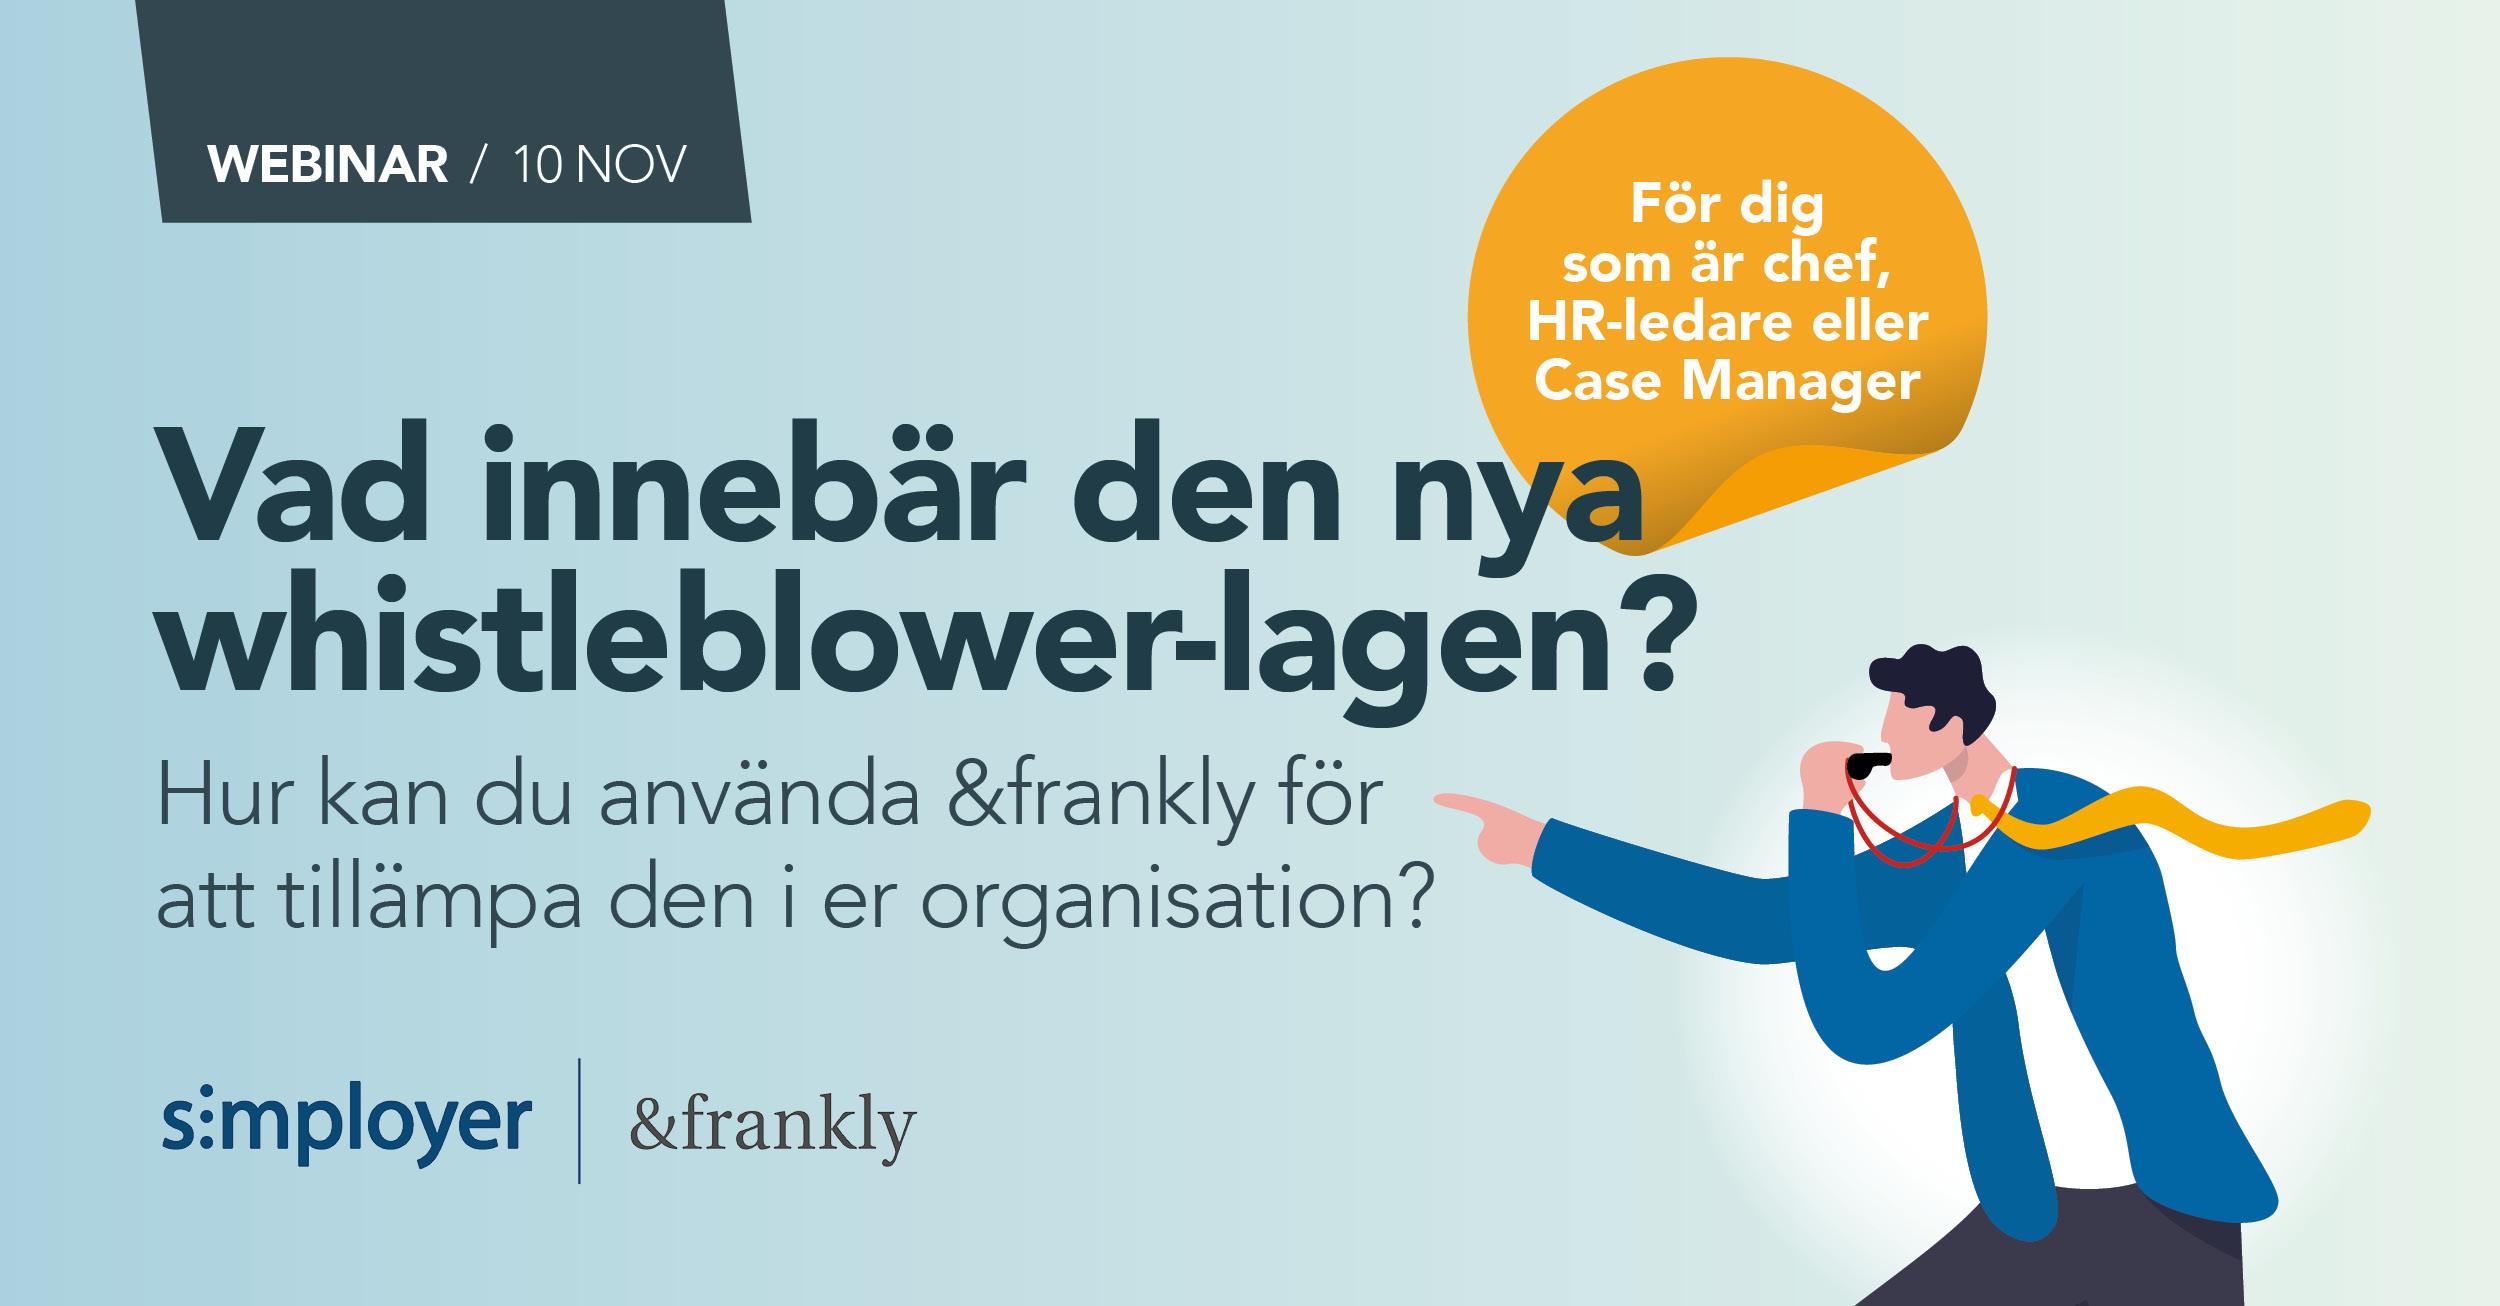 Whistleblower ad image